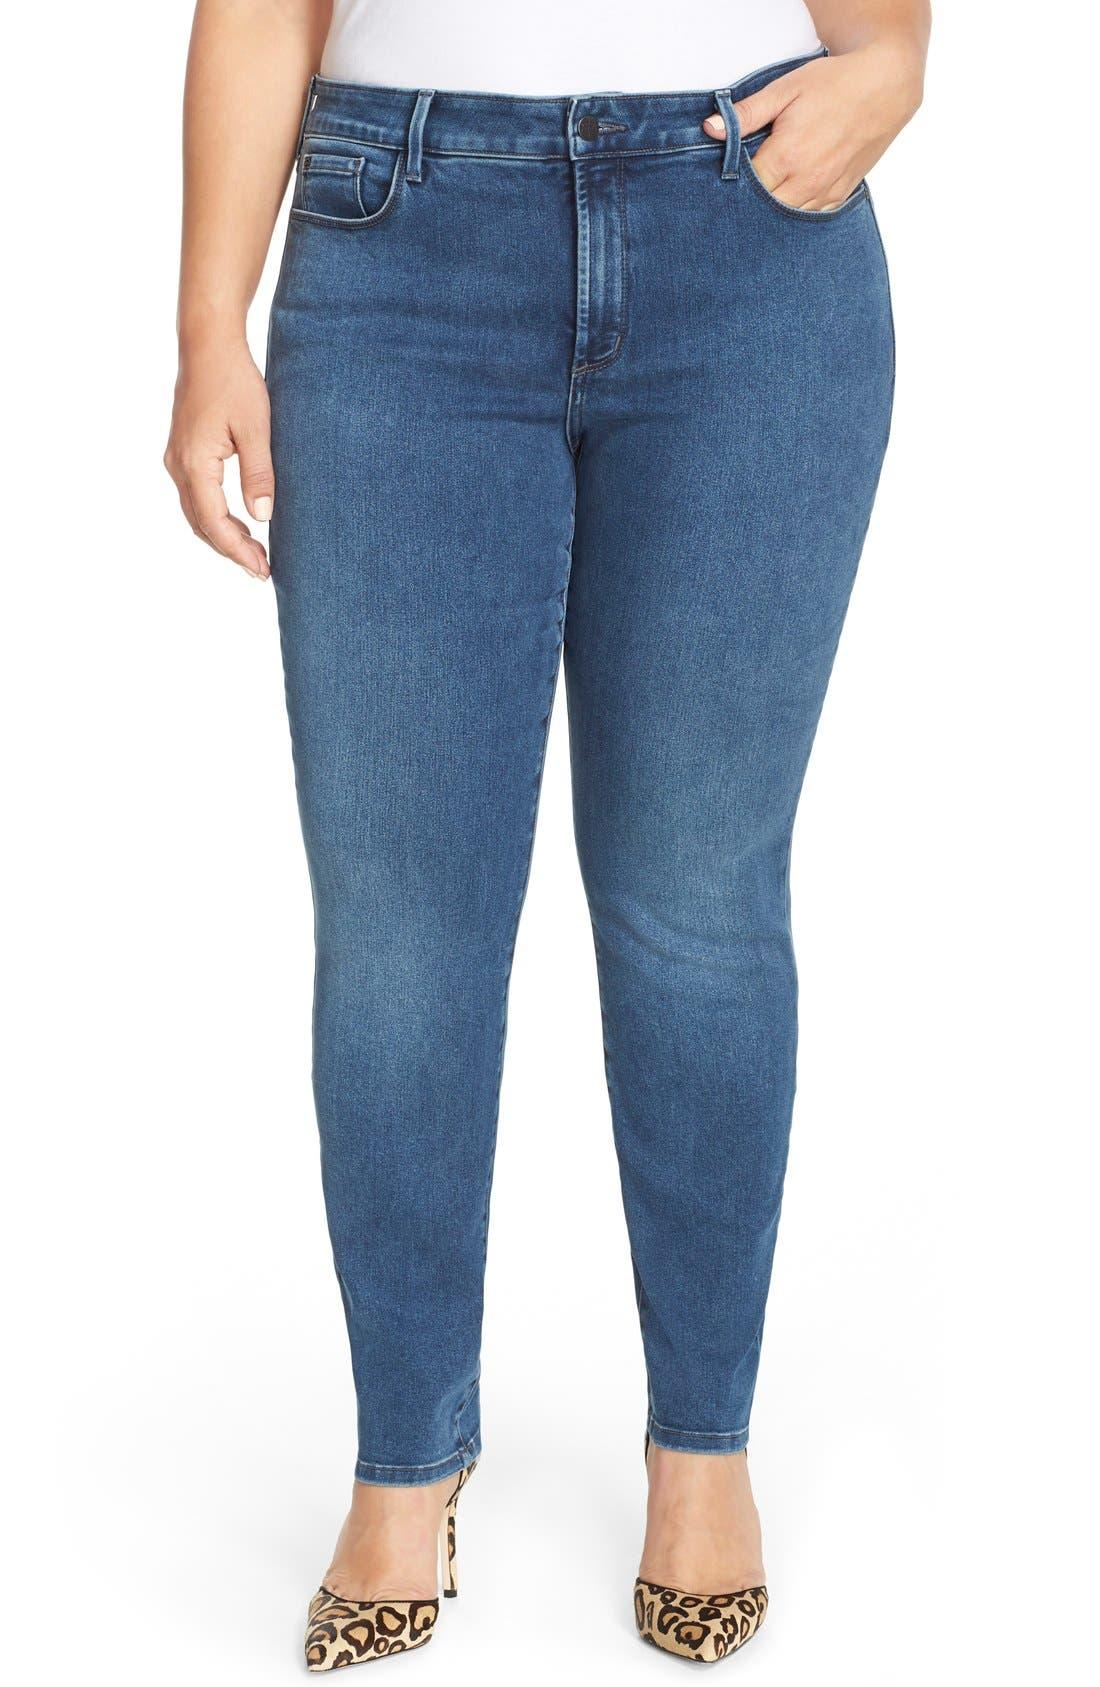 NYDJ 'Alina' Stretch Skinny Jeans, Main, color, 461